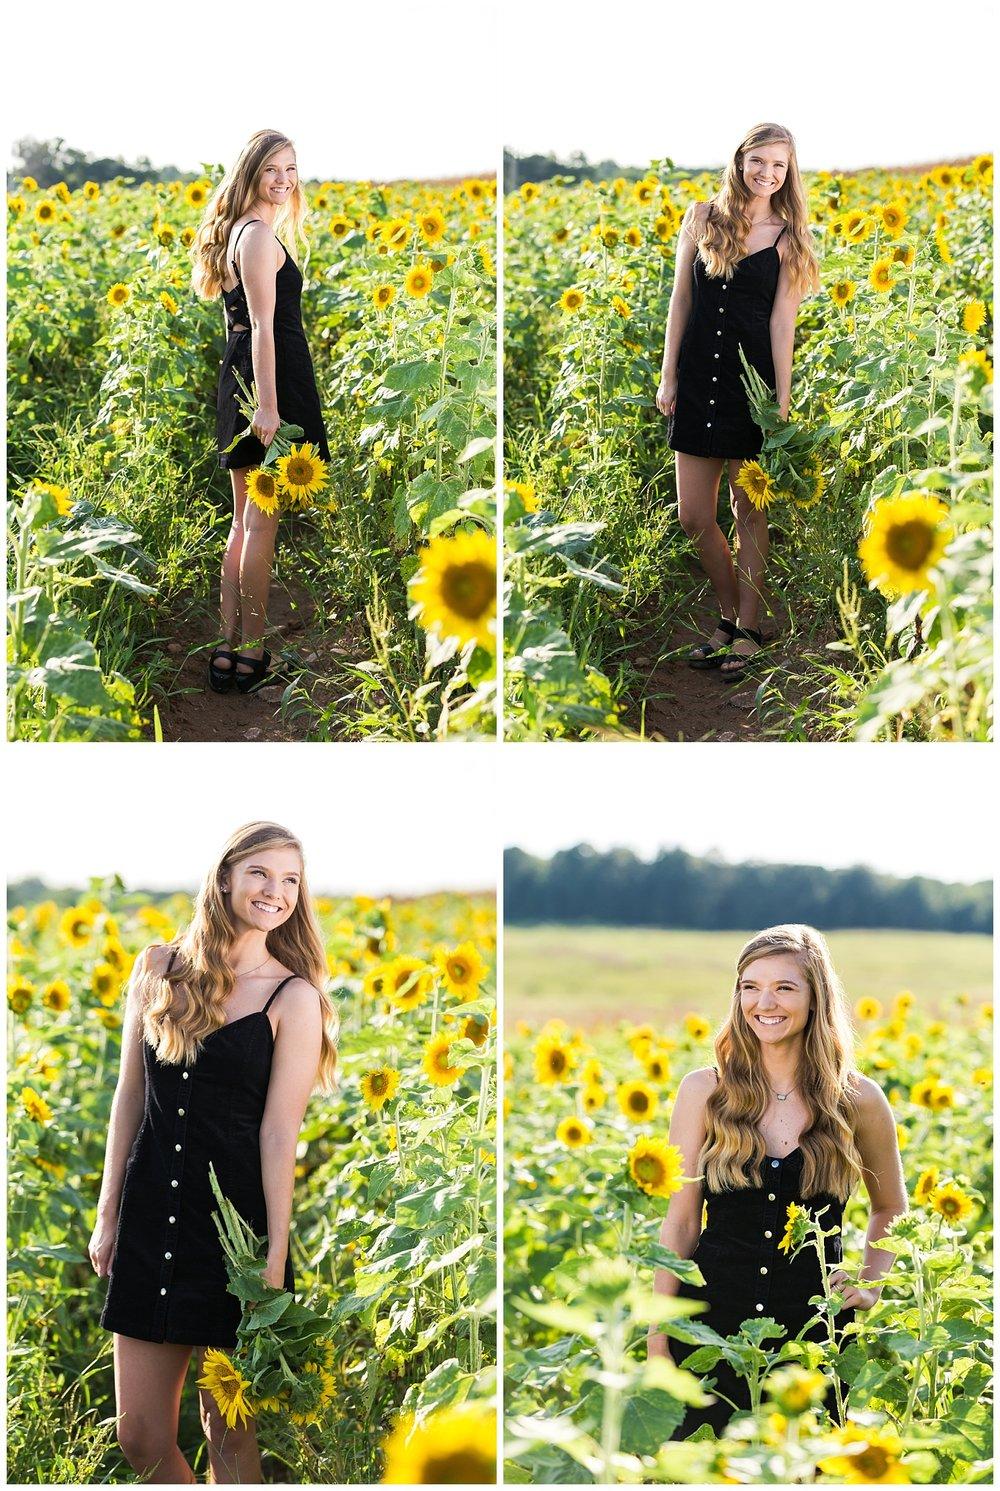 glenwood opelika auburn senior portraits sunflowers lbeesleyphoto